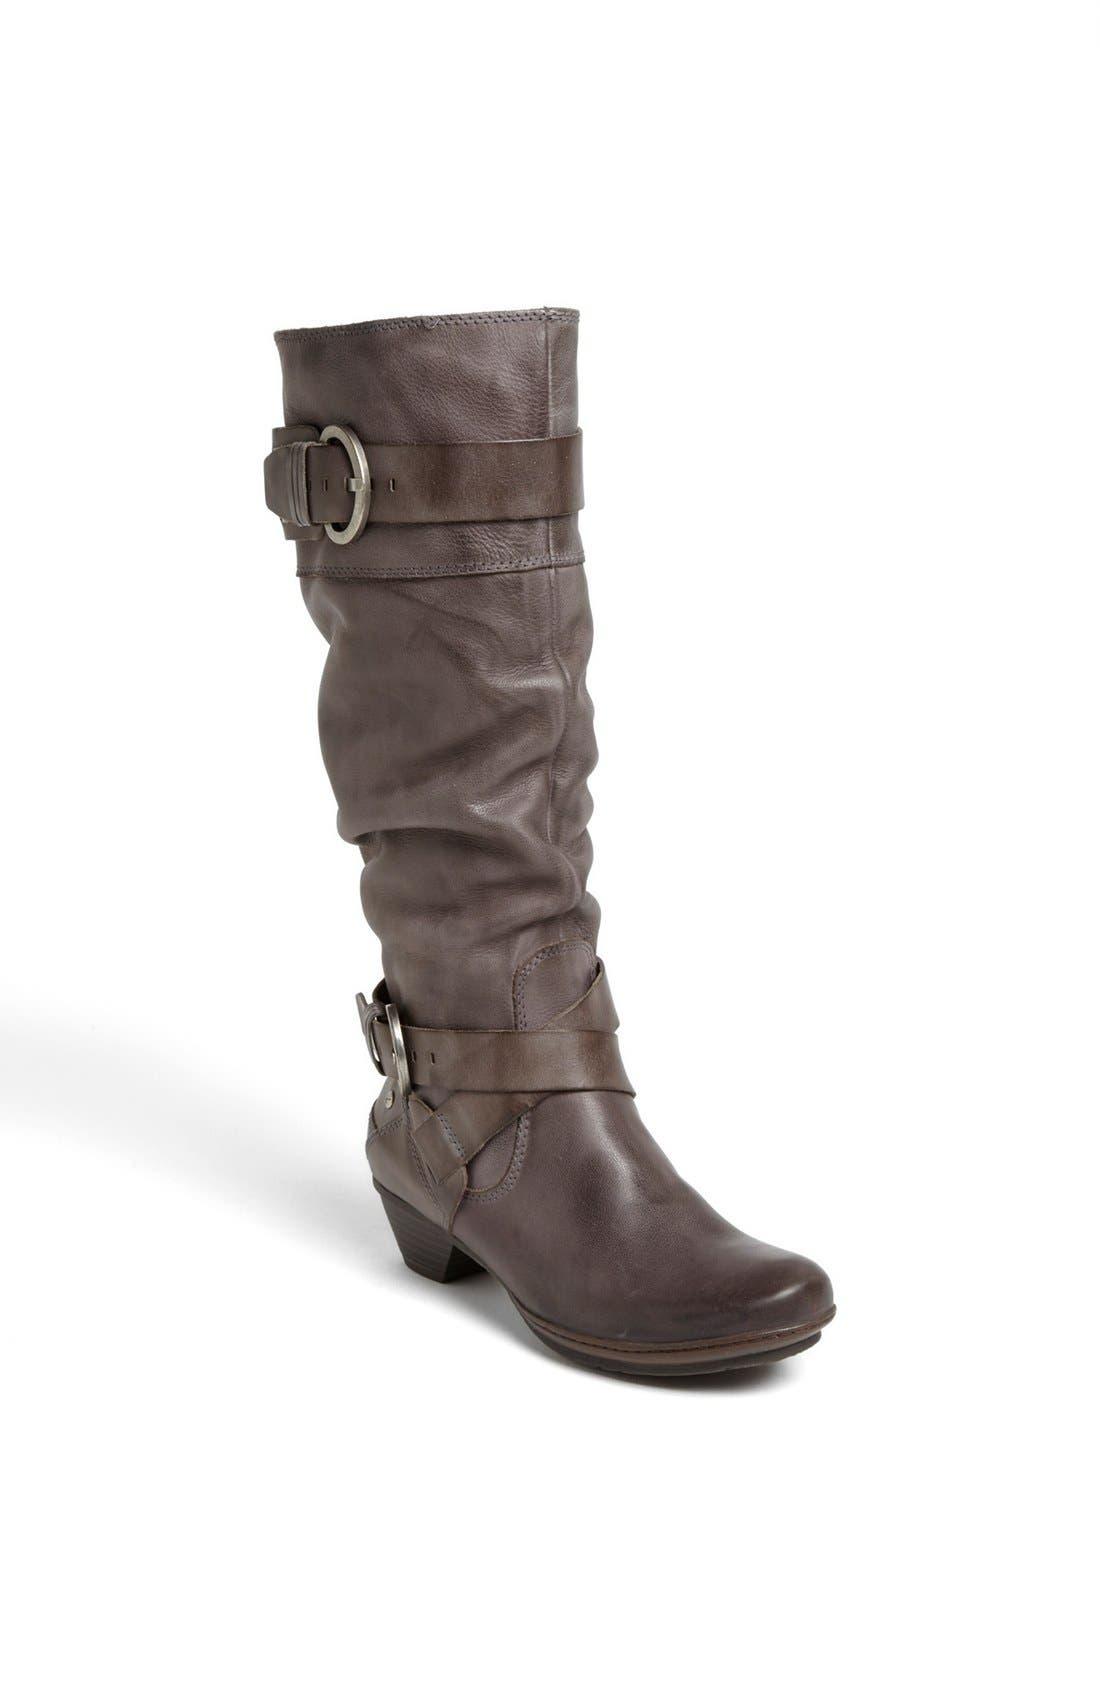 Alternate Image 1 Selected - PIKOLINOS 'Brujas' Boot